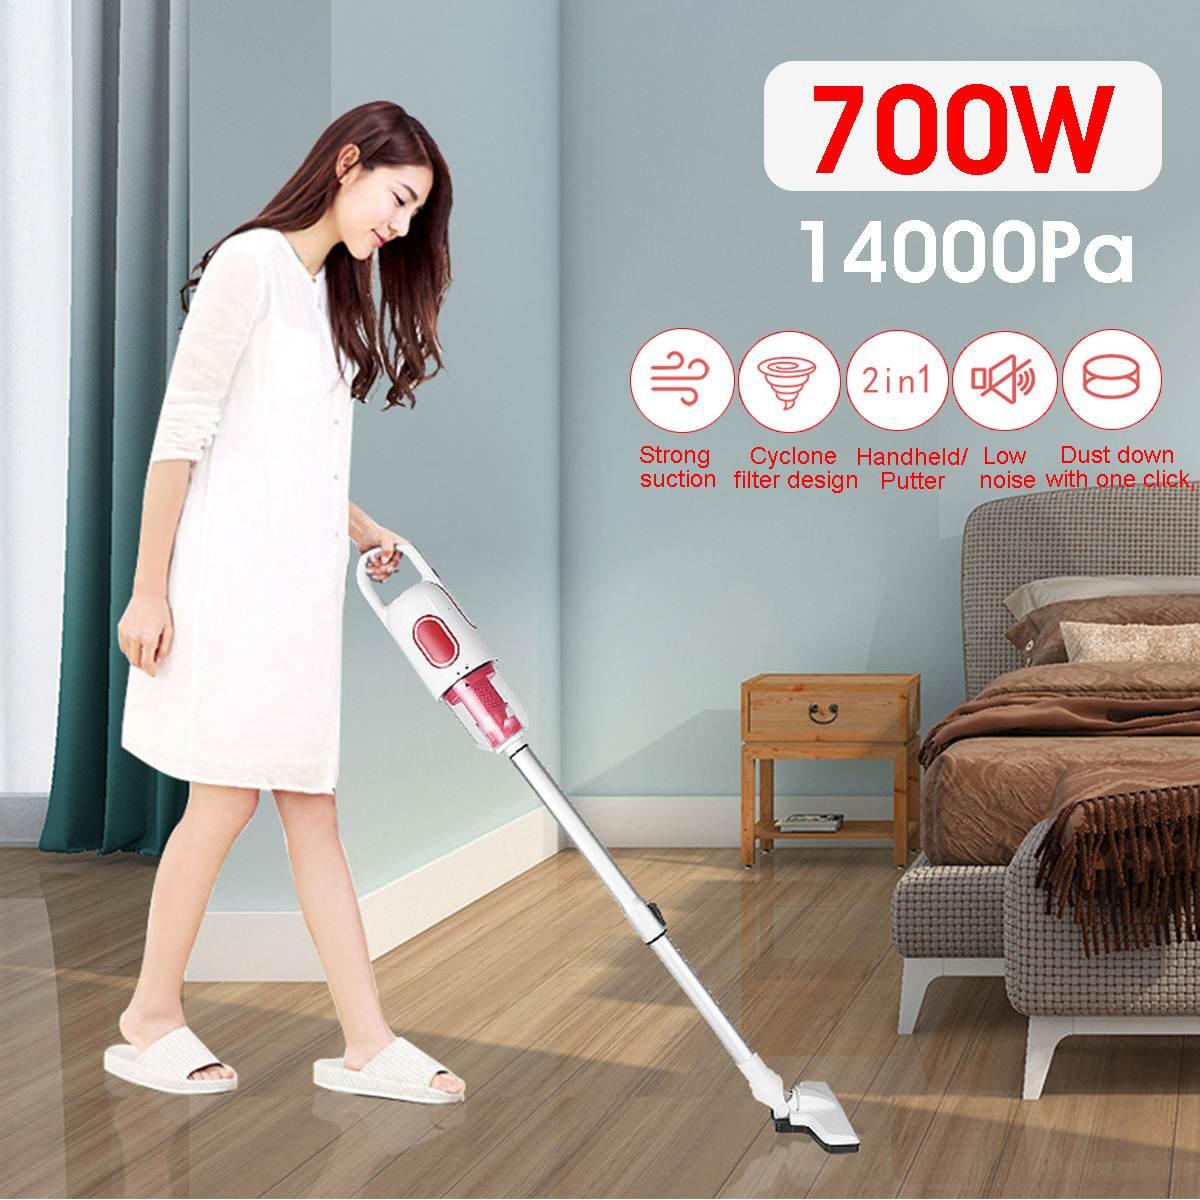 Becornce 700 واط 14000Pa 2 في 1 يد مكنسة كهربائية المنزل تنظيف قوي شفط مجمع الغبار تمديد المحمولة قضيب